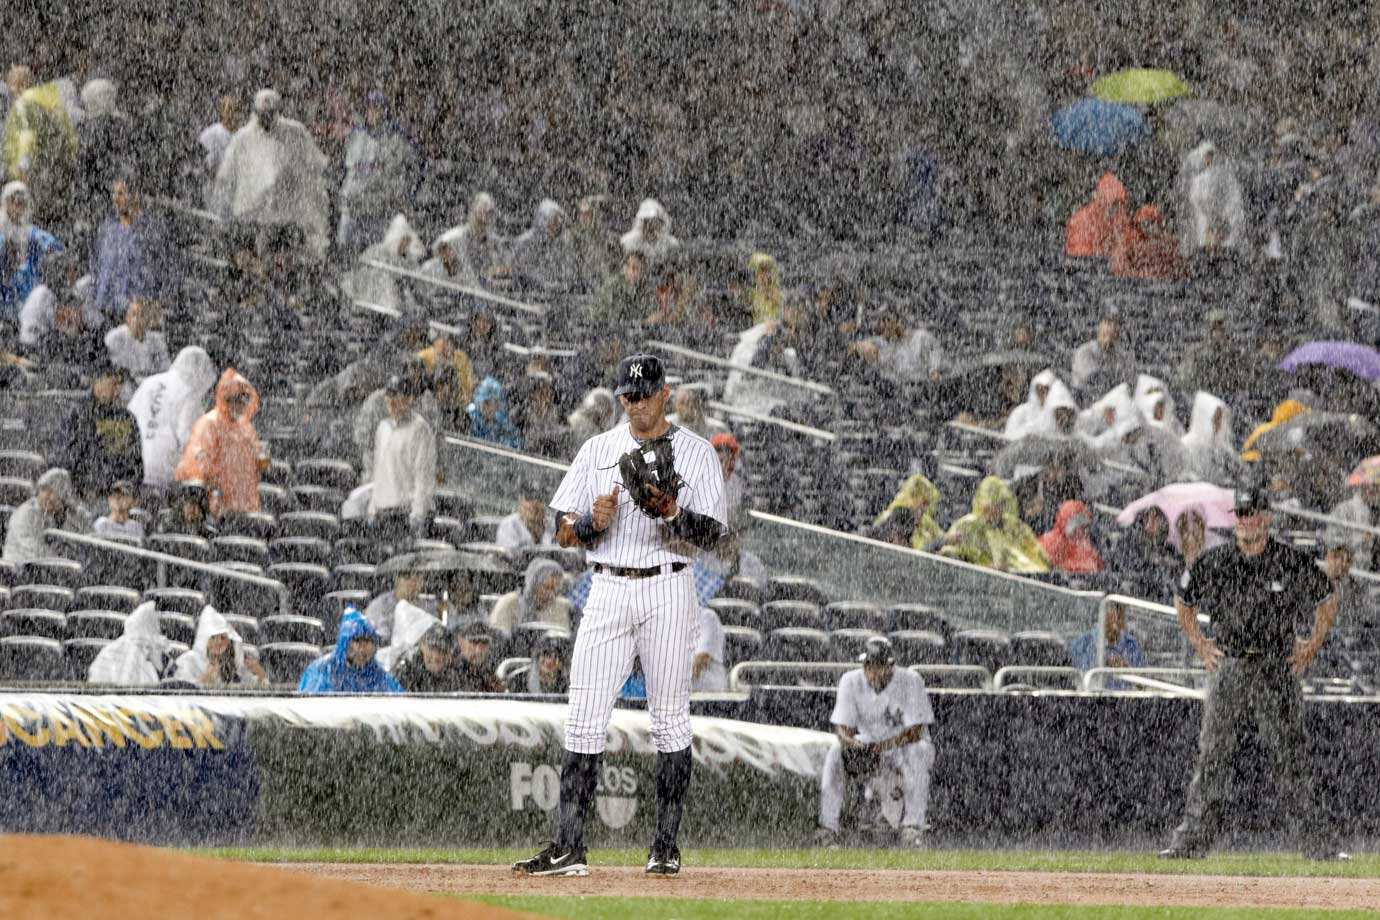 2011 American League Division Series, Game 1